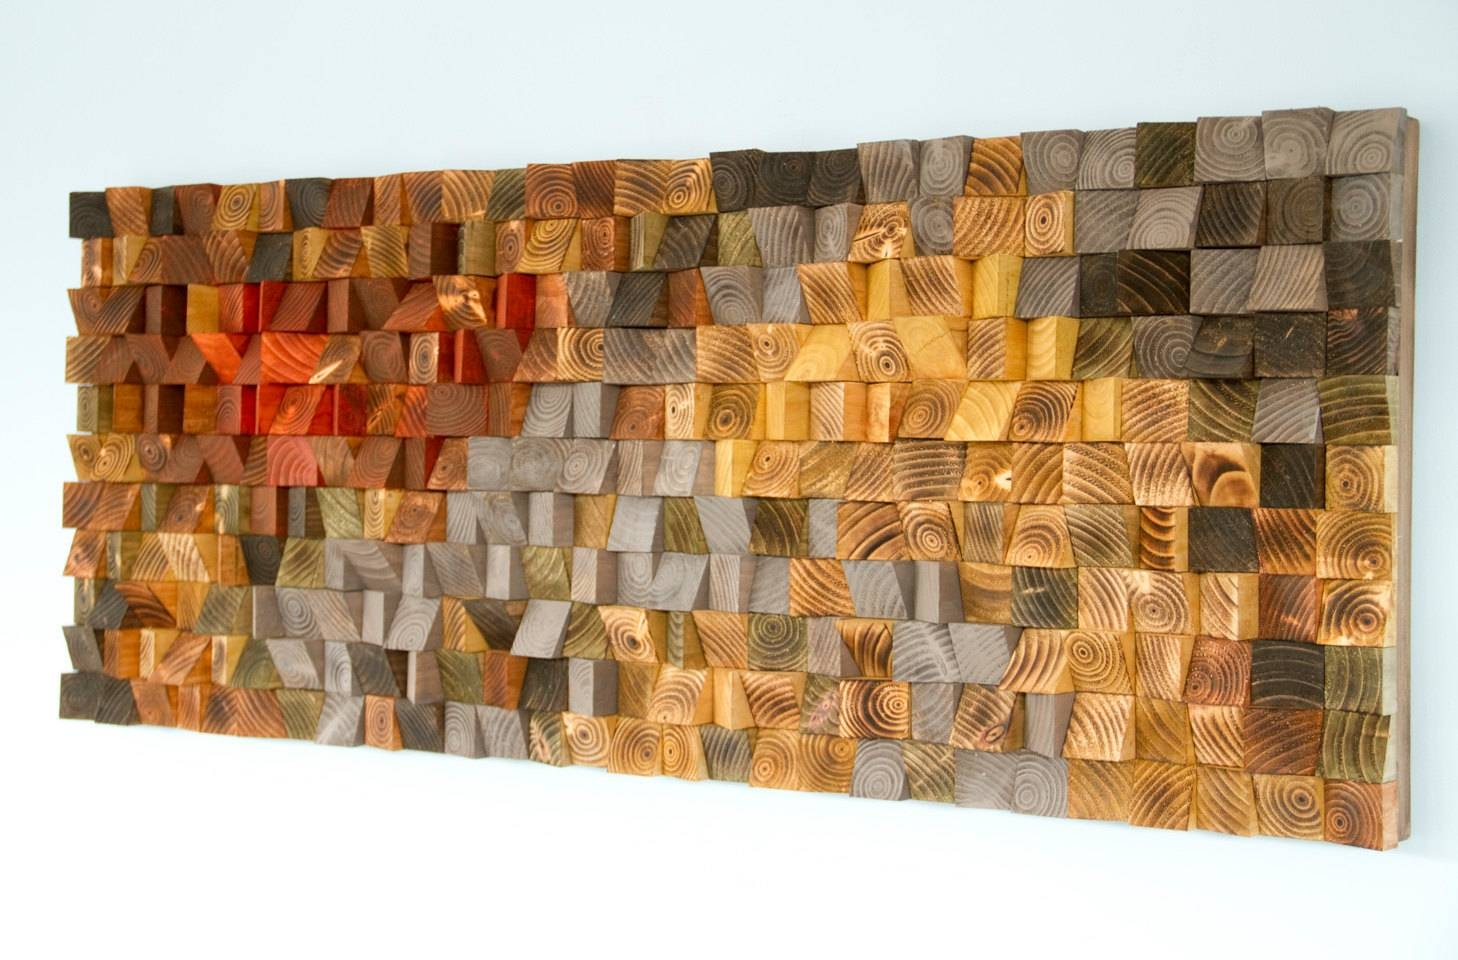 Rustic Wood Wall Art, Wood Wall Sculpture, Abstract Wood Art – Art Within 2018 Abstract Wall Art 3D (View 16 of 20)